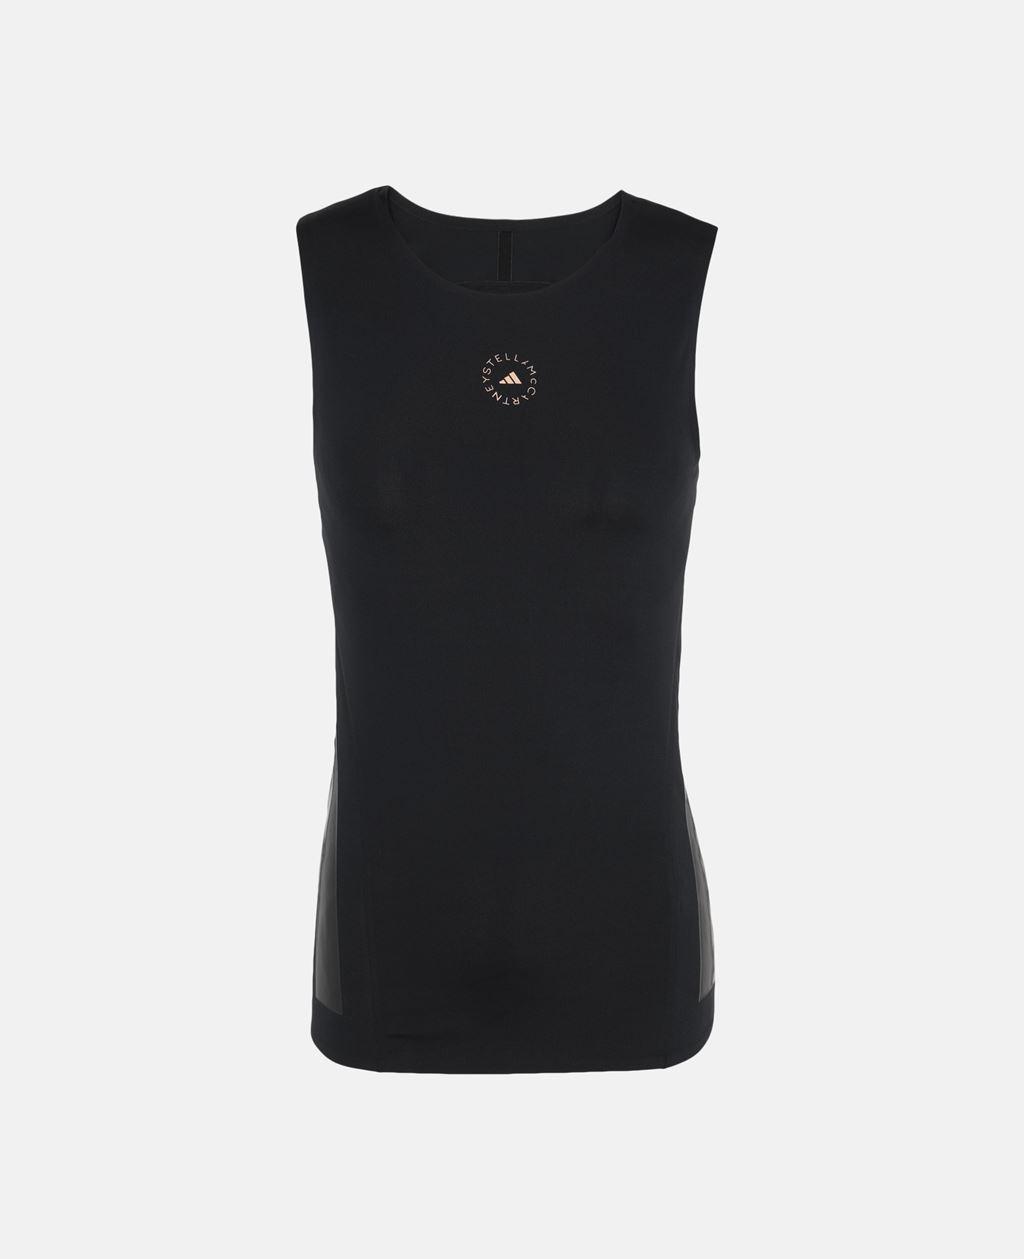 Stella McCartney Black Black Training Vest